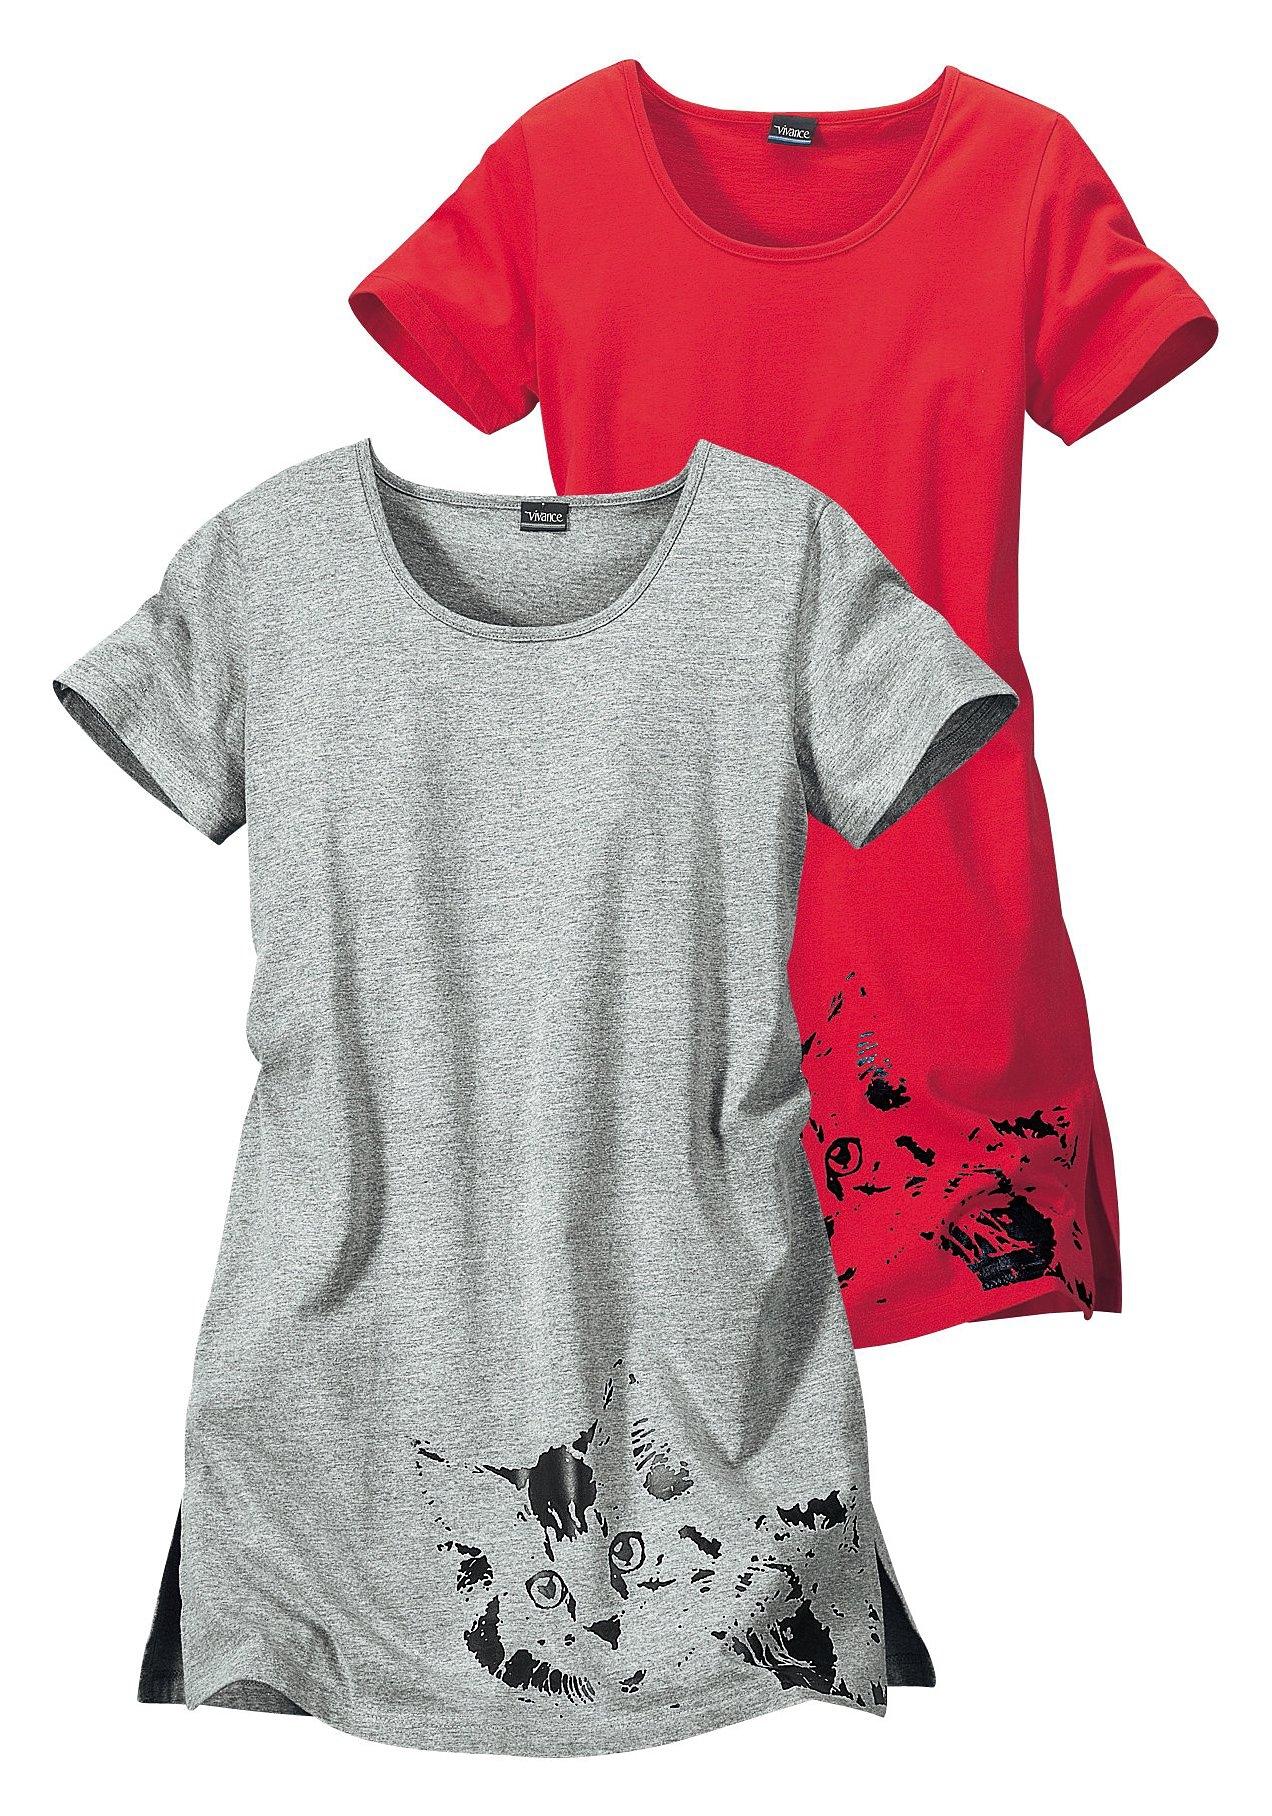 Vivance Collection Kort nachthemd, set van 2 - verschillende betaalmethodes